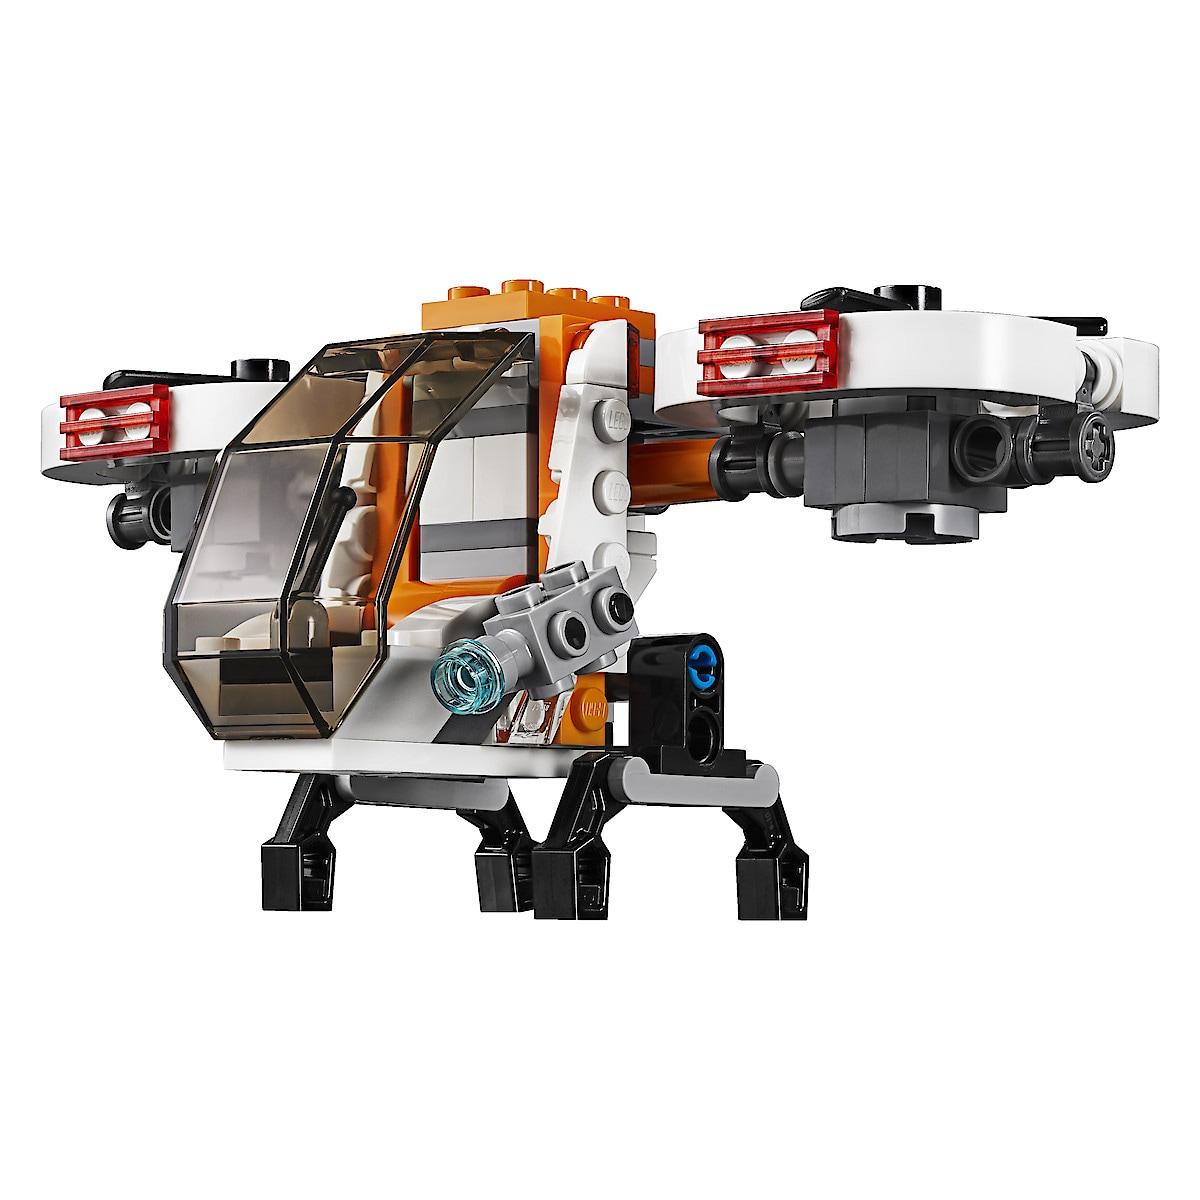 LEGO Creator 31071, Drönarutforskare 3-in-1